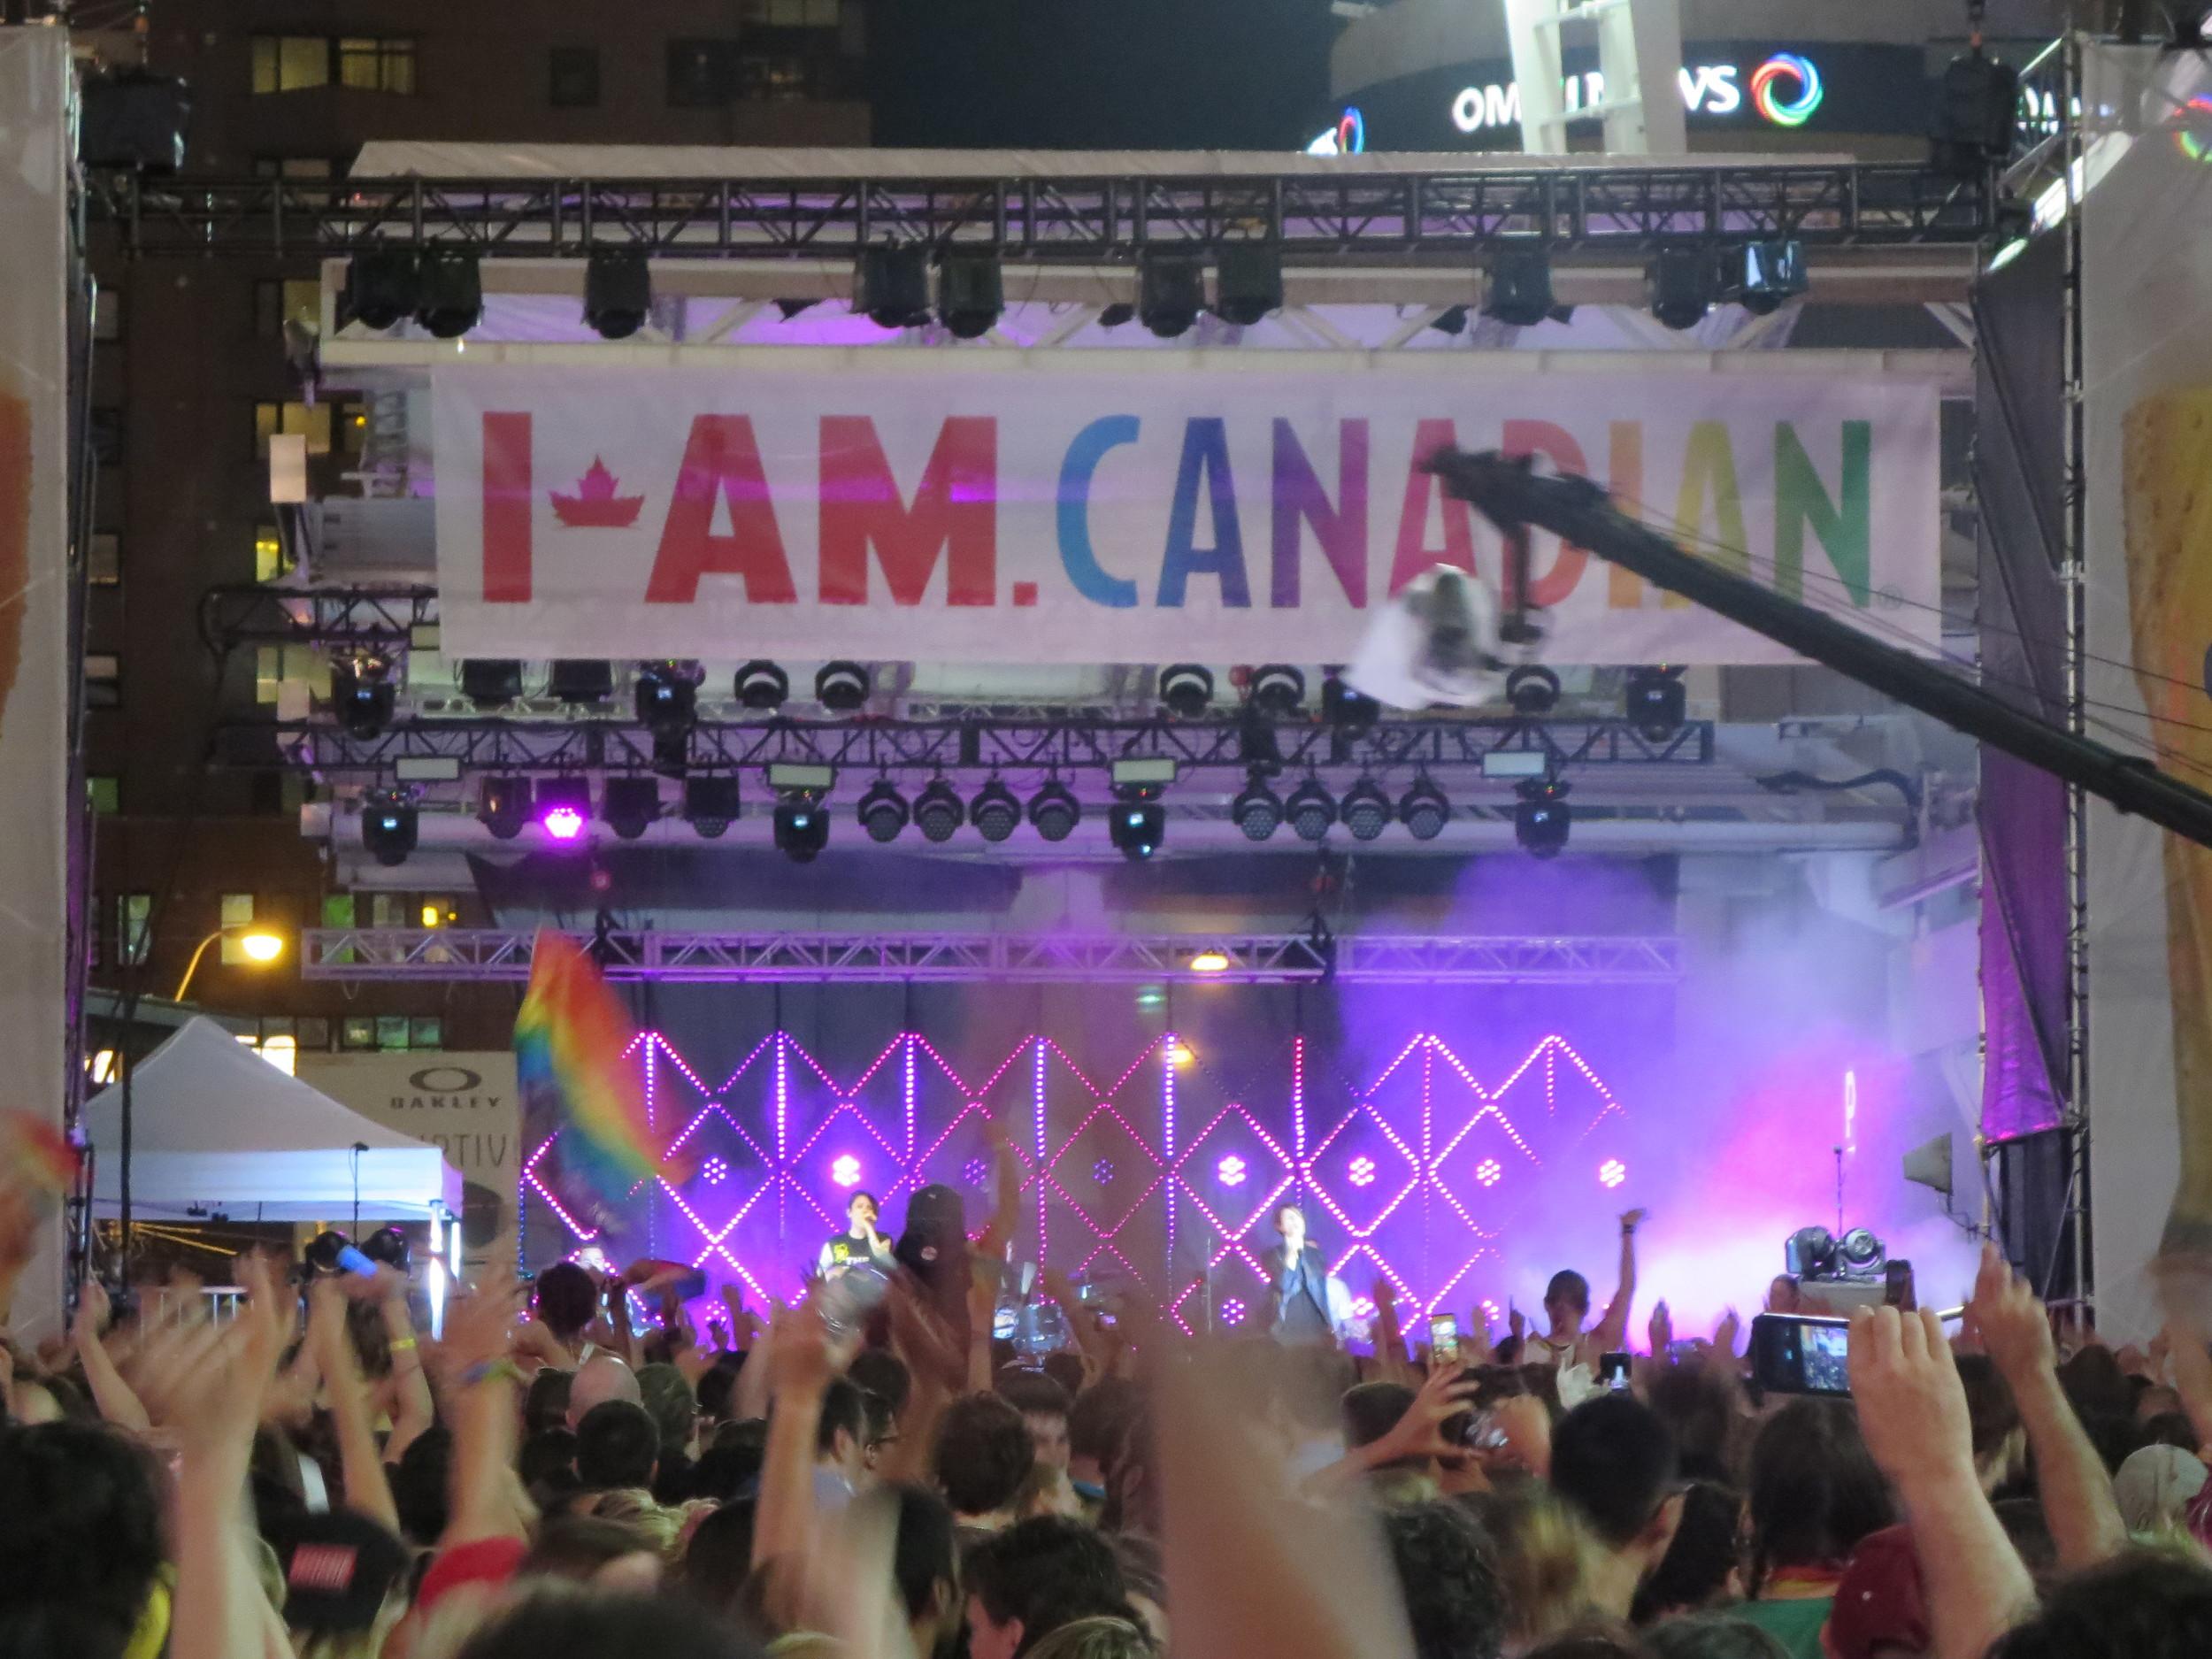 Tegan and Sara - I am Canadian